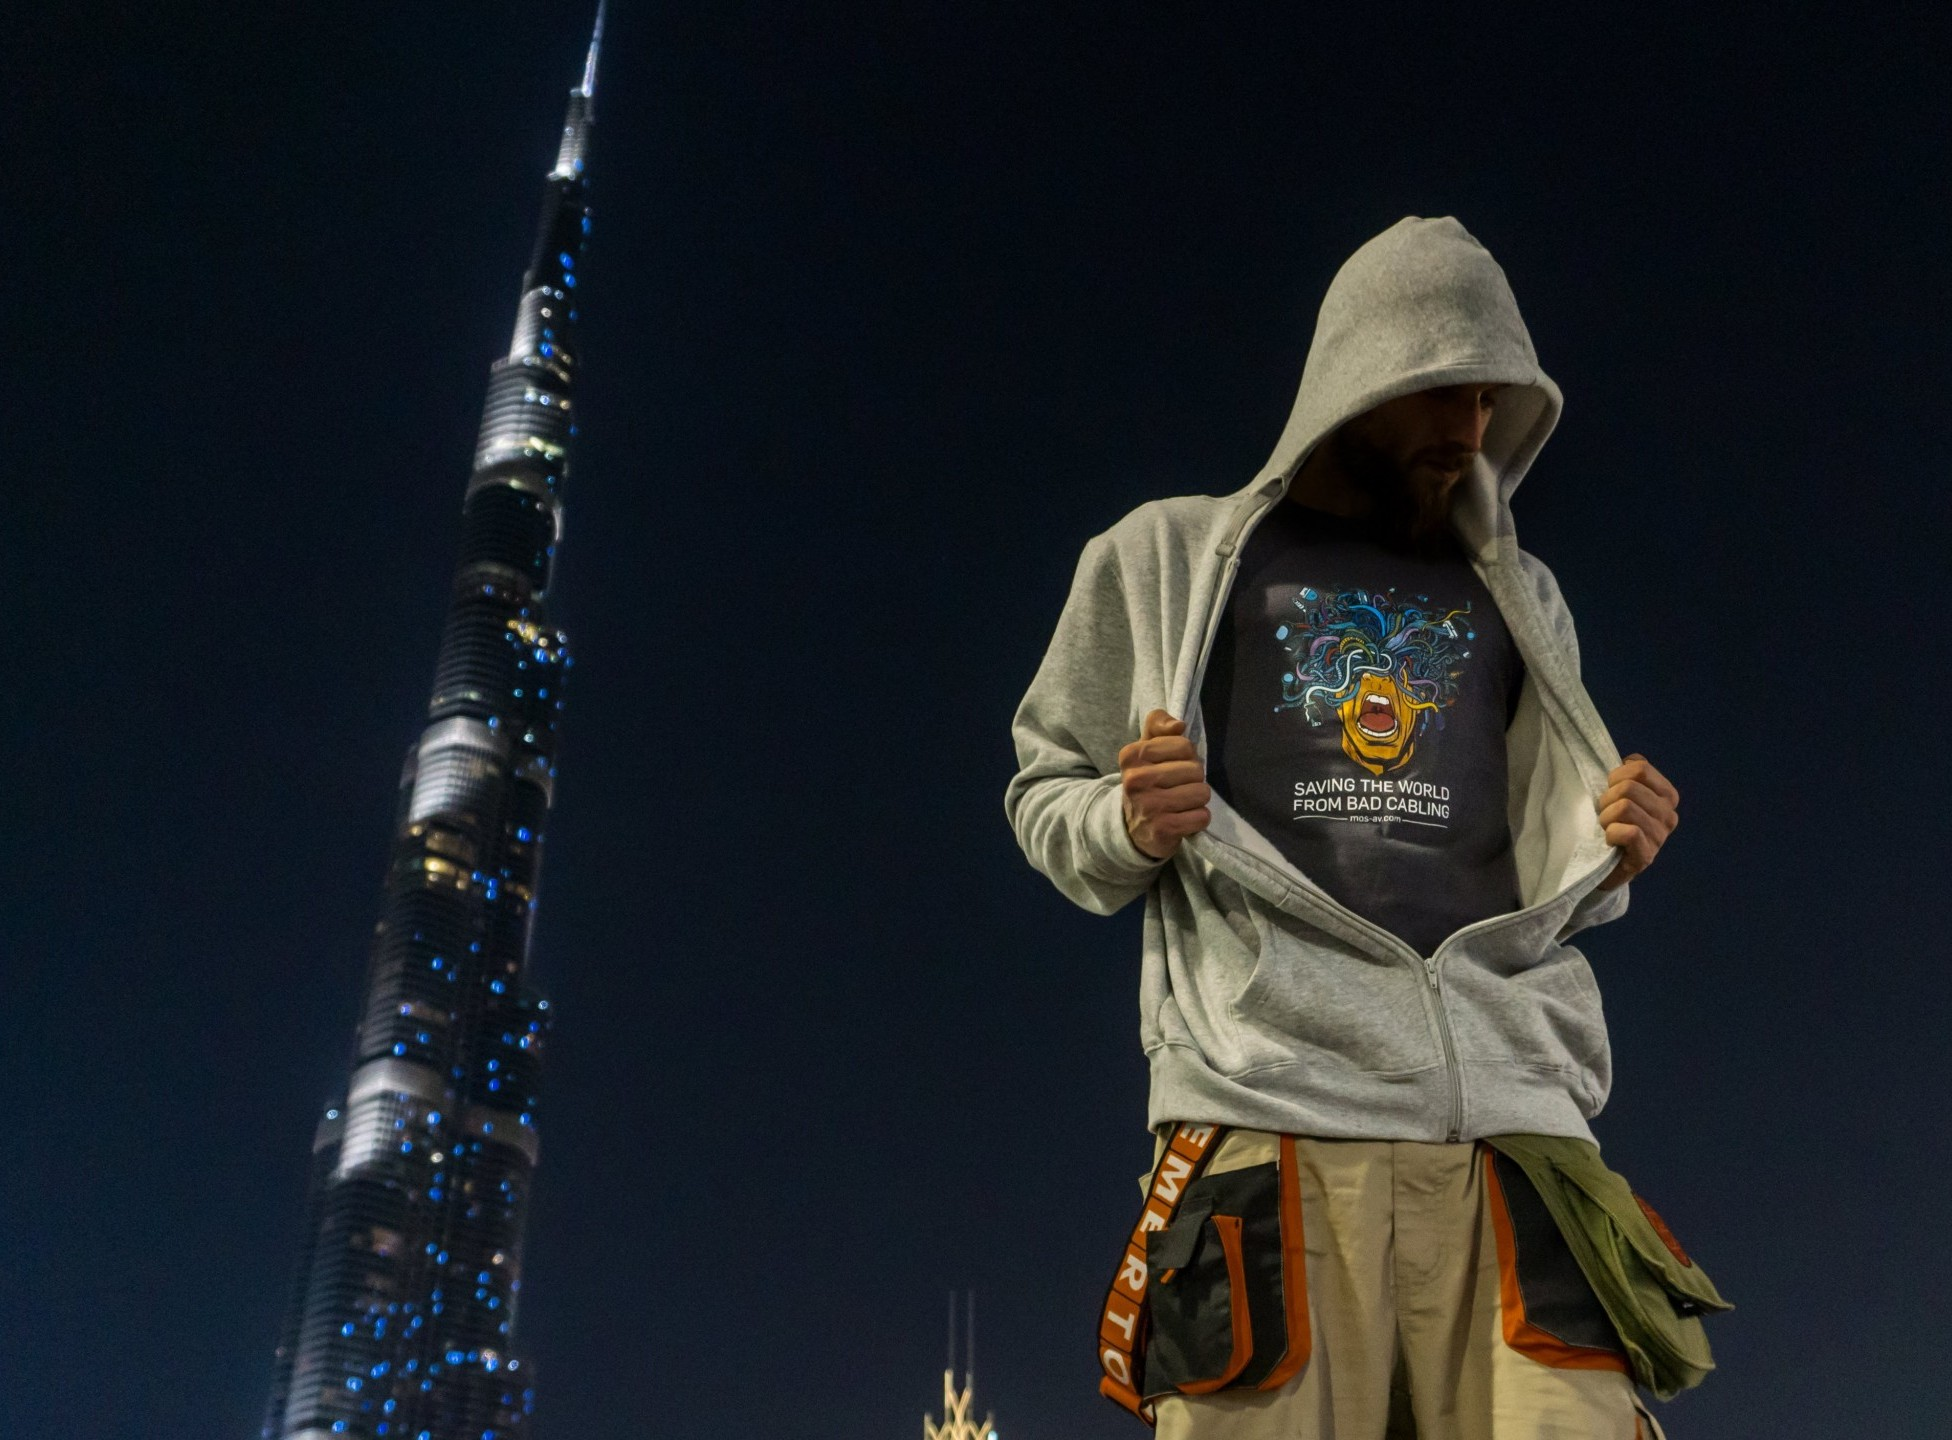 Bloomberg Business News Channel, Dubai